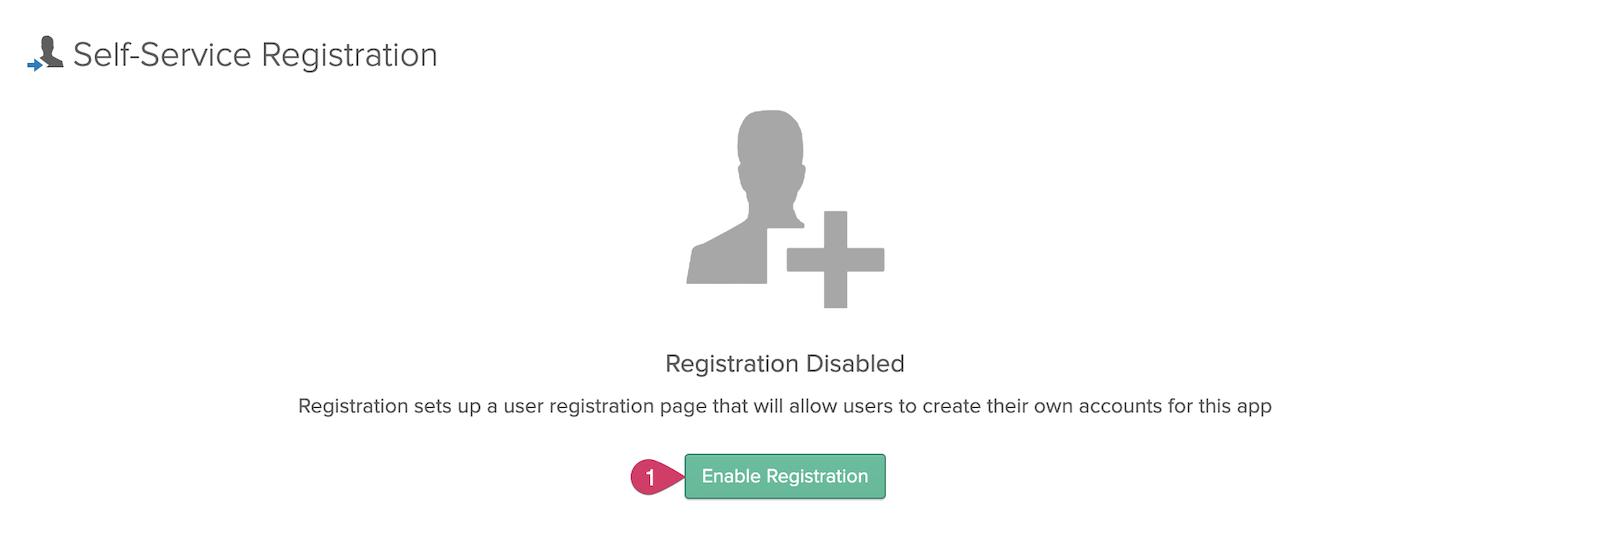 Enable Registration